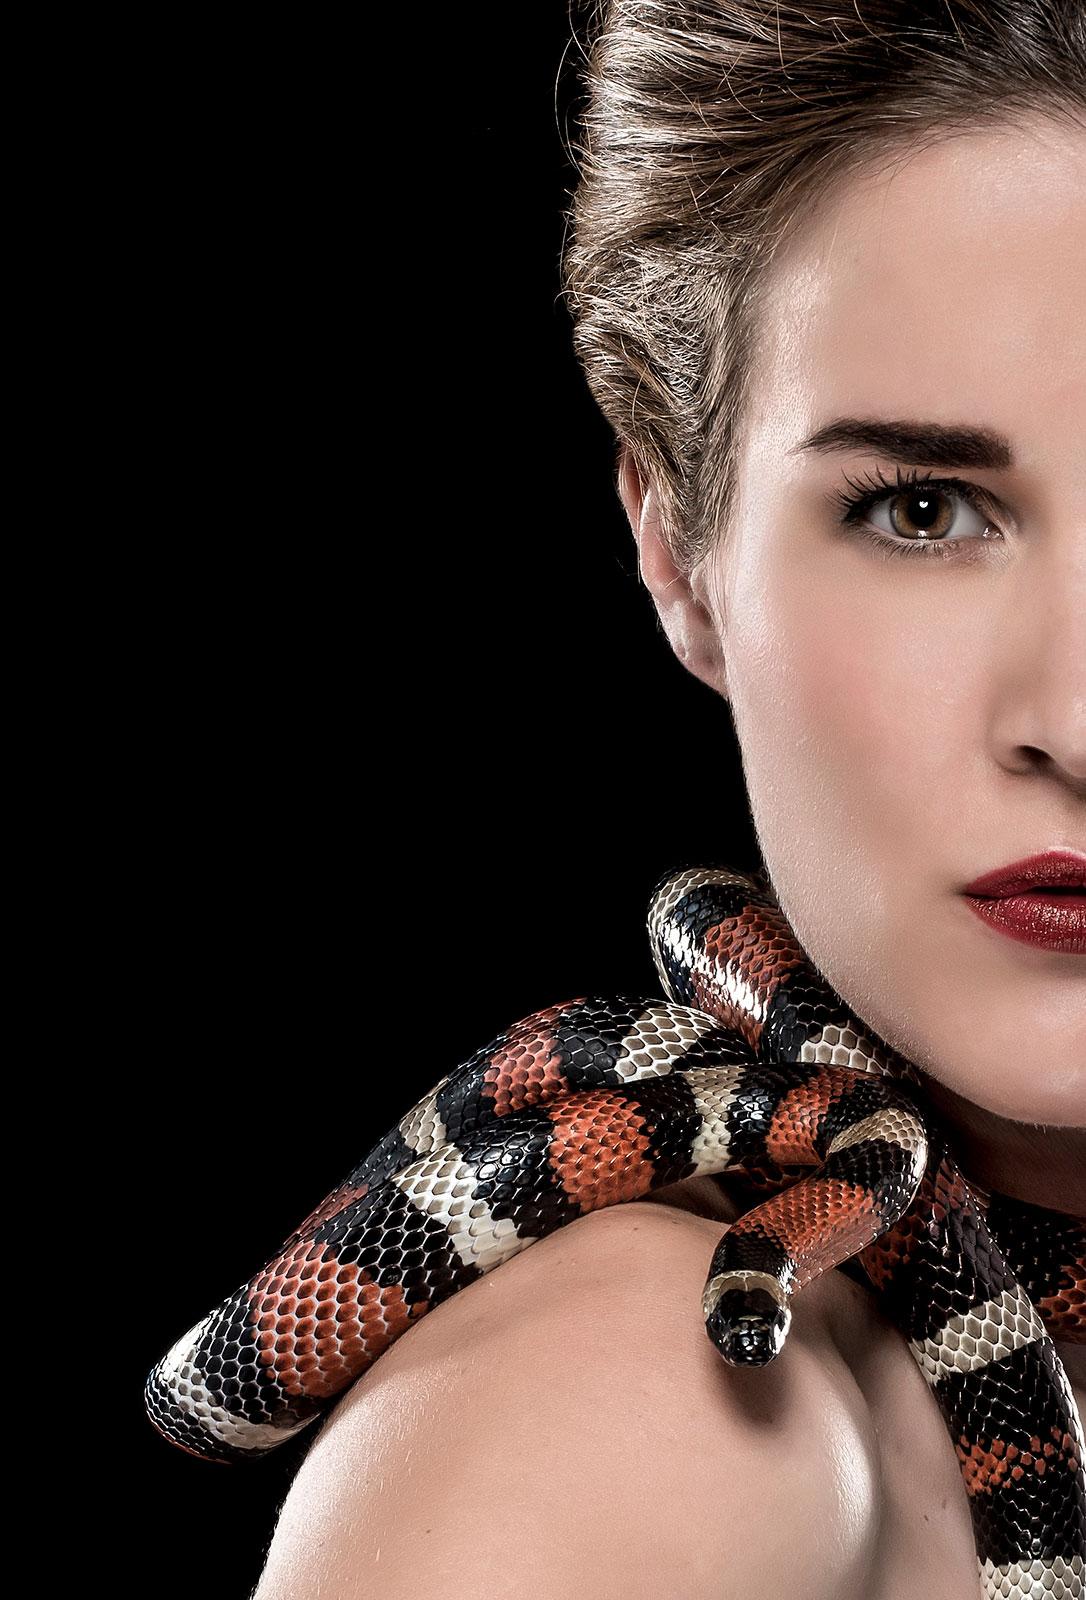 Léahnan, deelneemster aan snakeshootevent